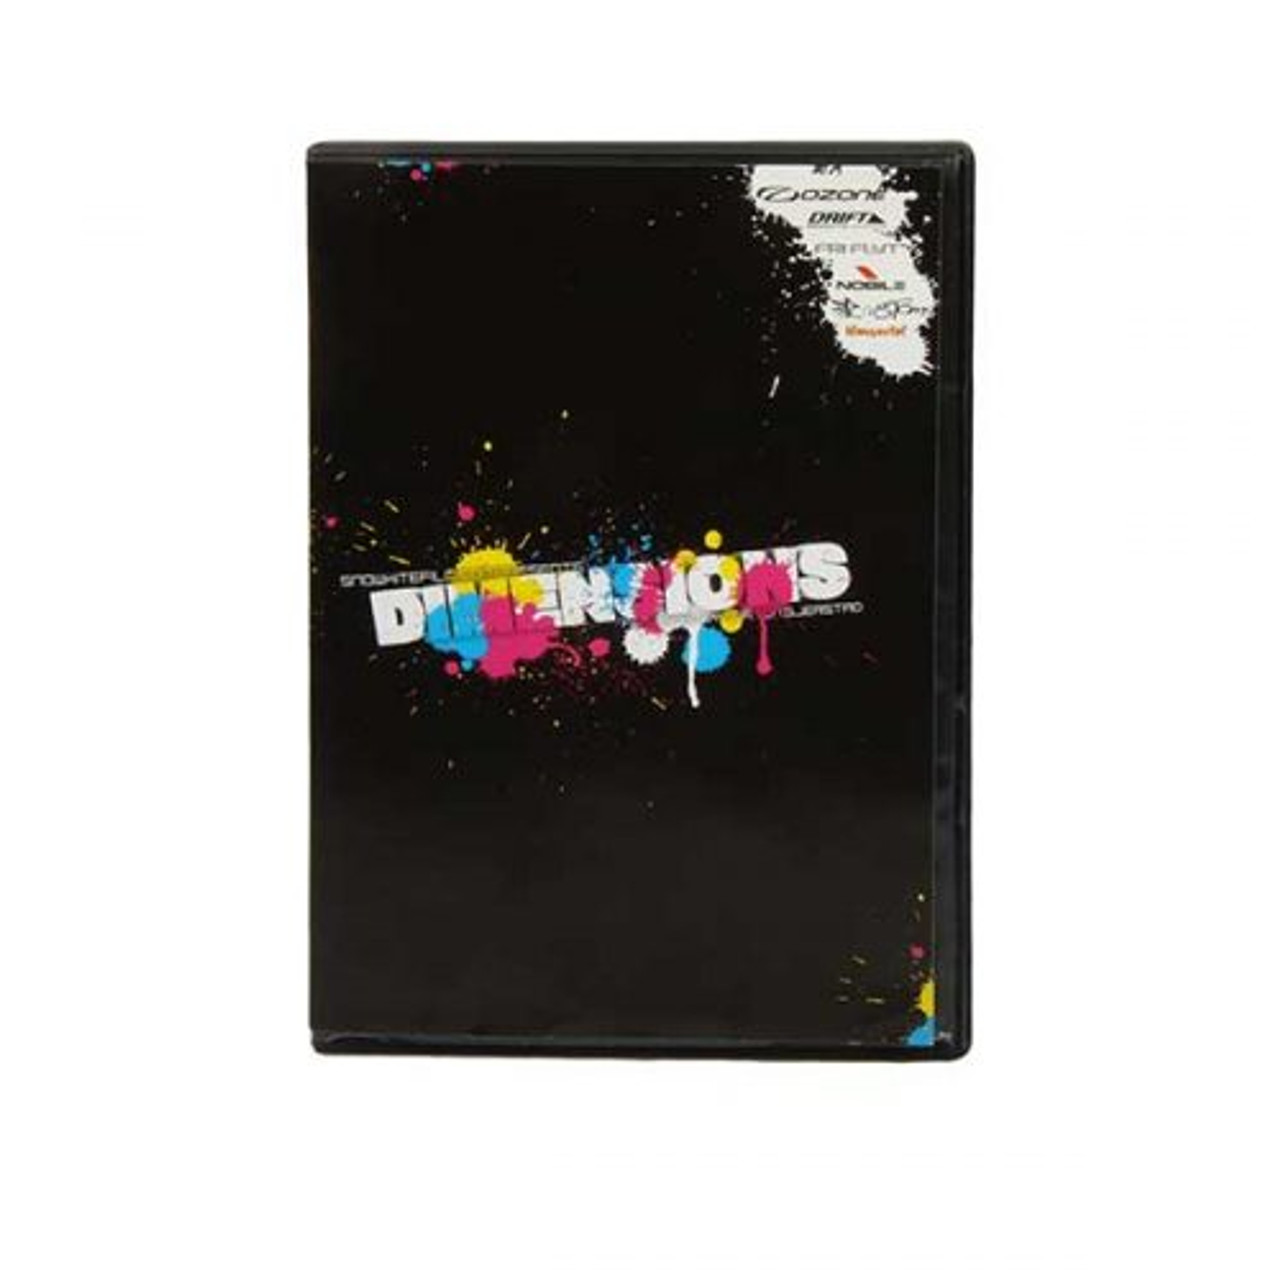 Dimensions Snowkite DVD